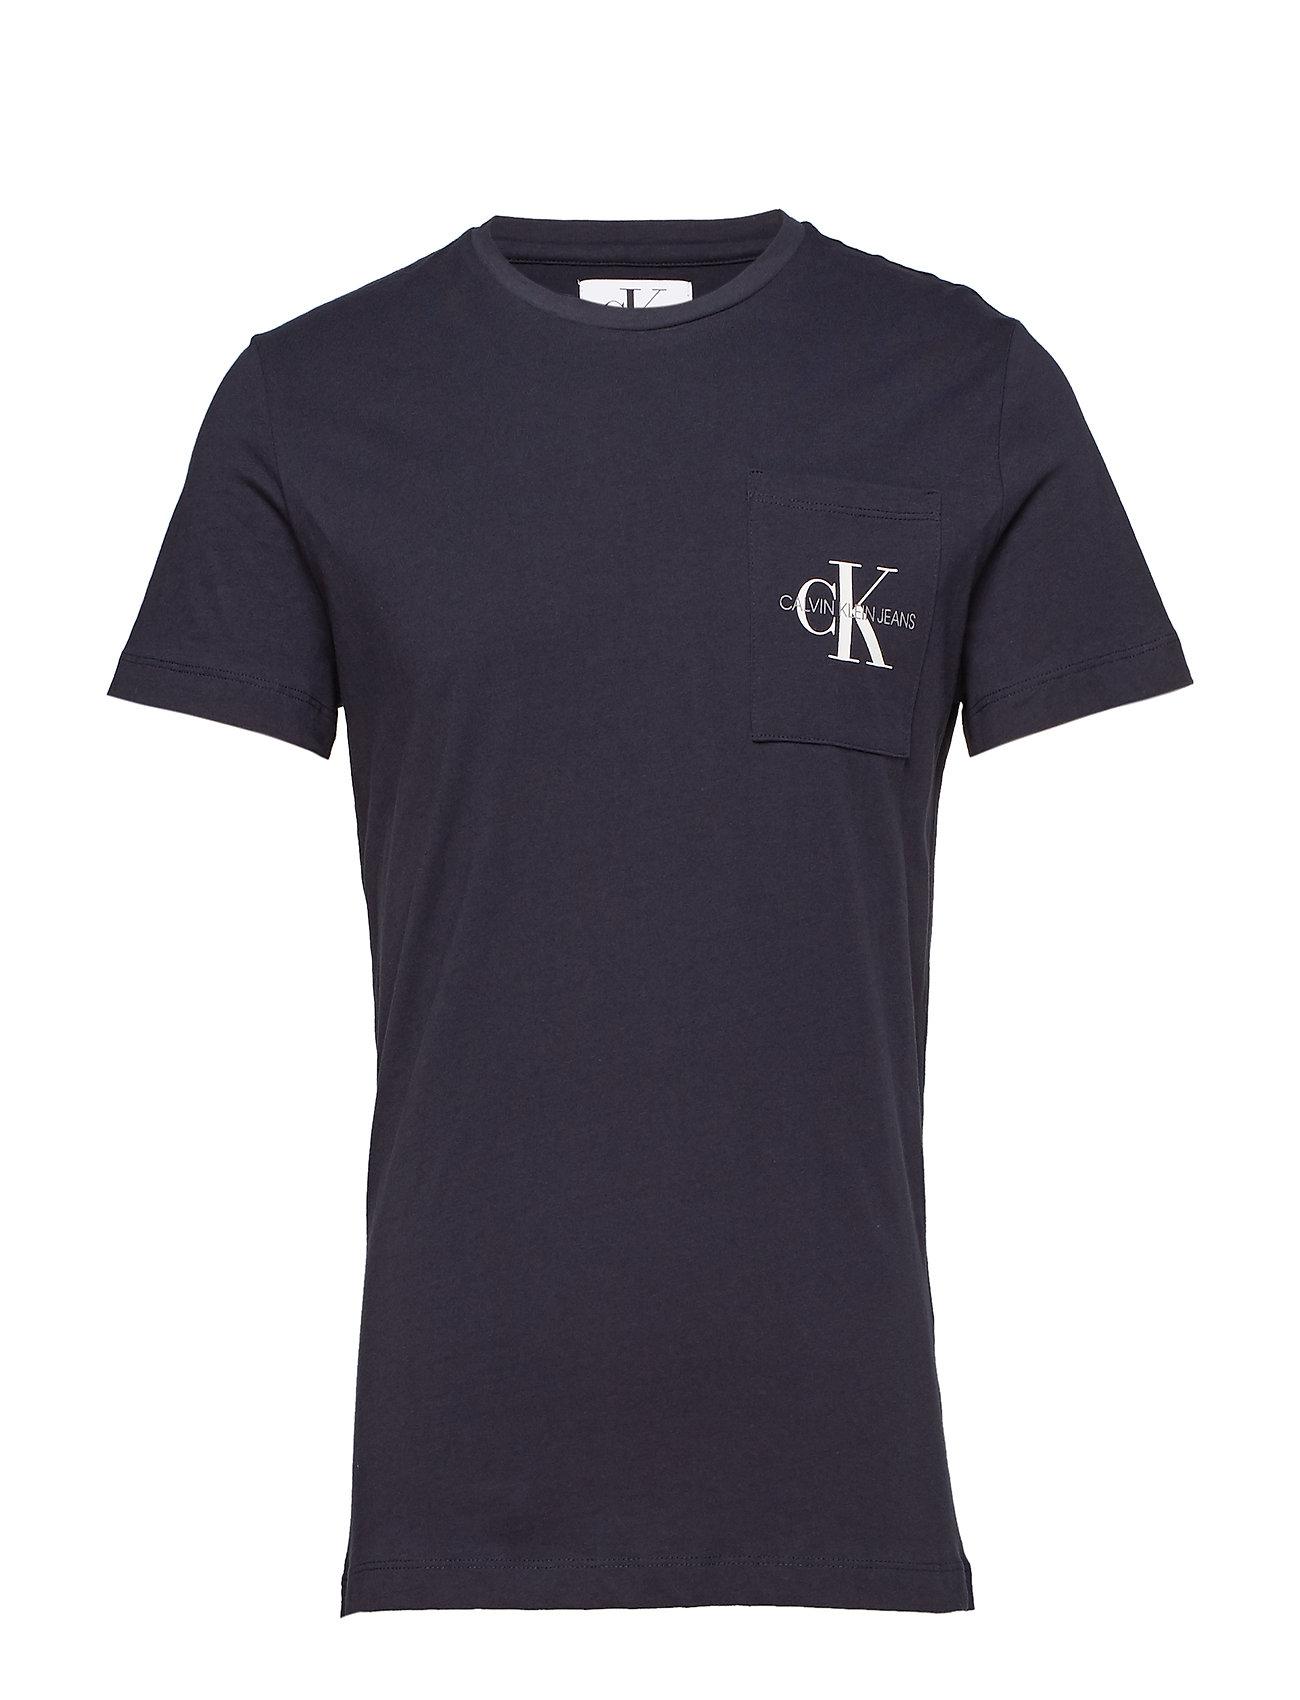 Klein Monogram Pocket SkyCalvin Jeans Slimnight rxstQhdC